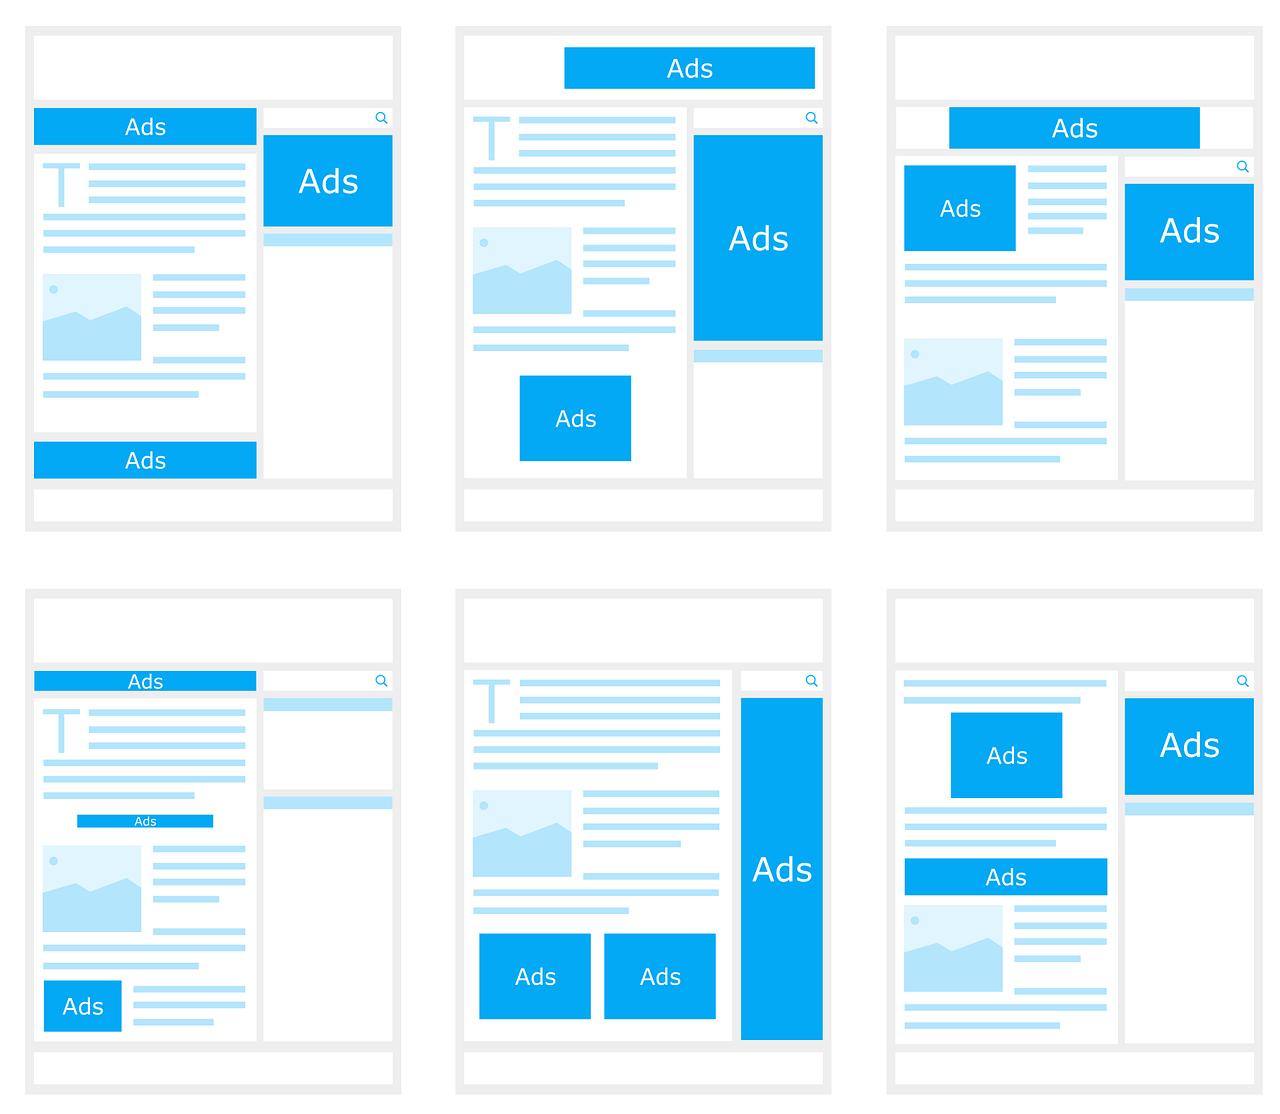 How to Add AdSense to WordPress